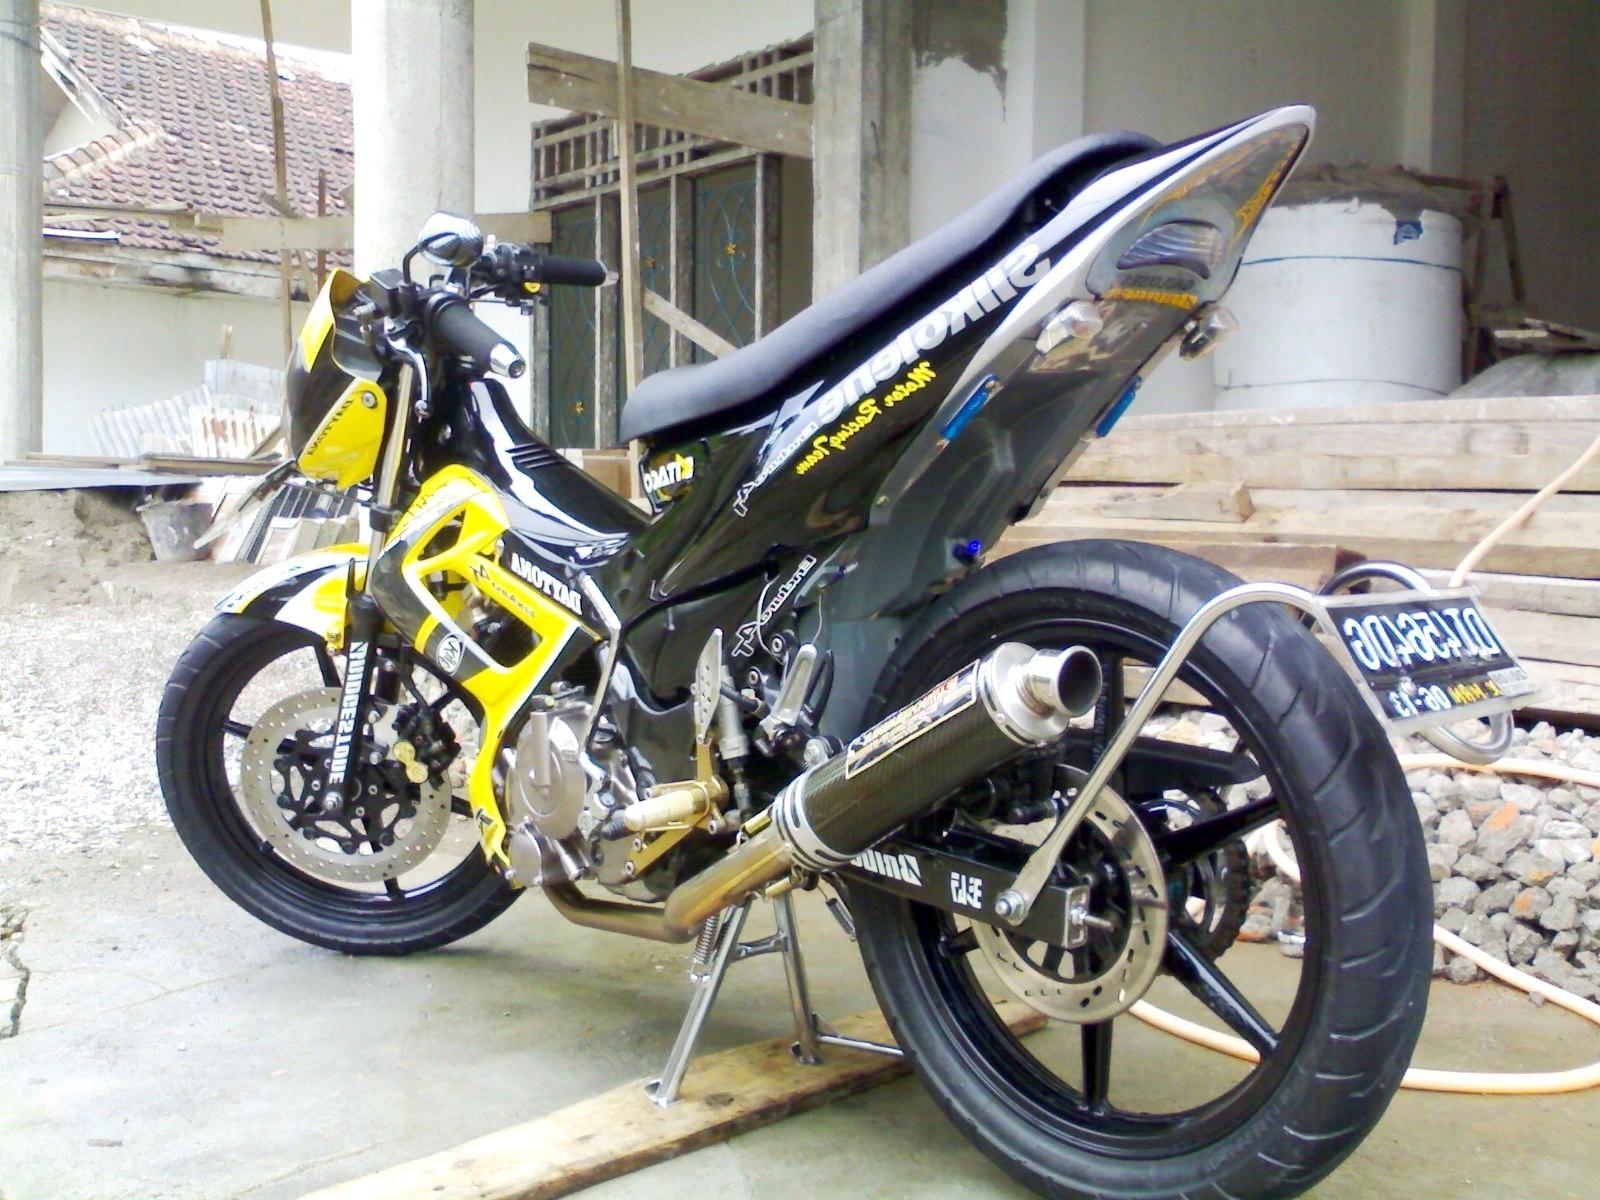 86 Foto Modifikasi Motor Satria Fu 2014 TeaModifikasi